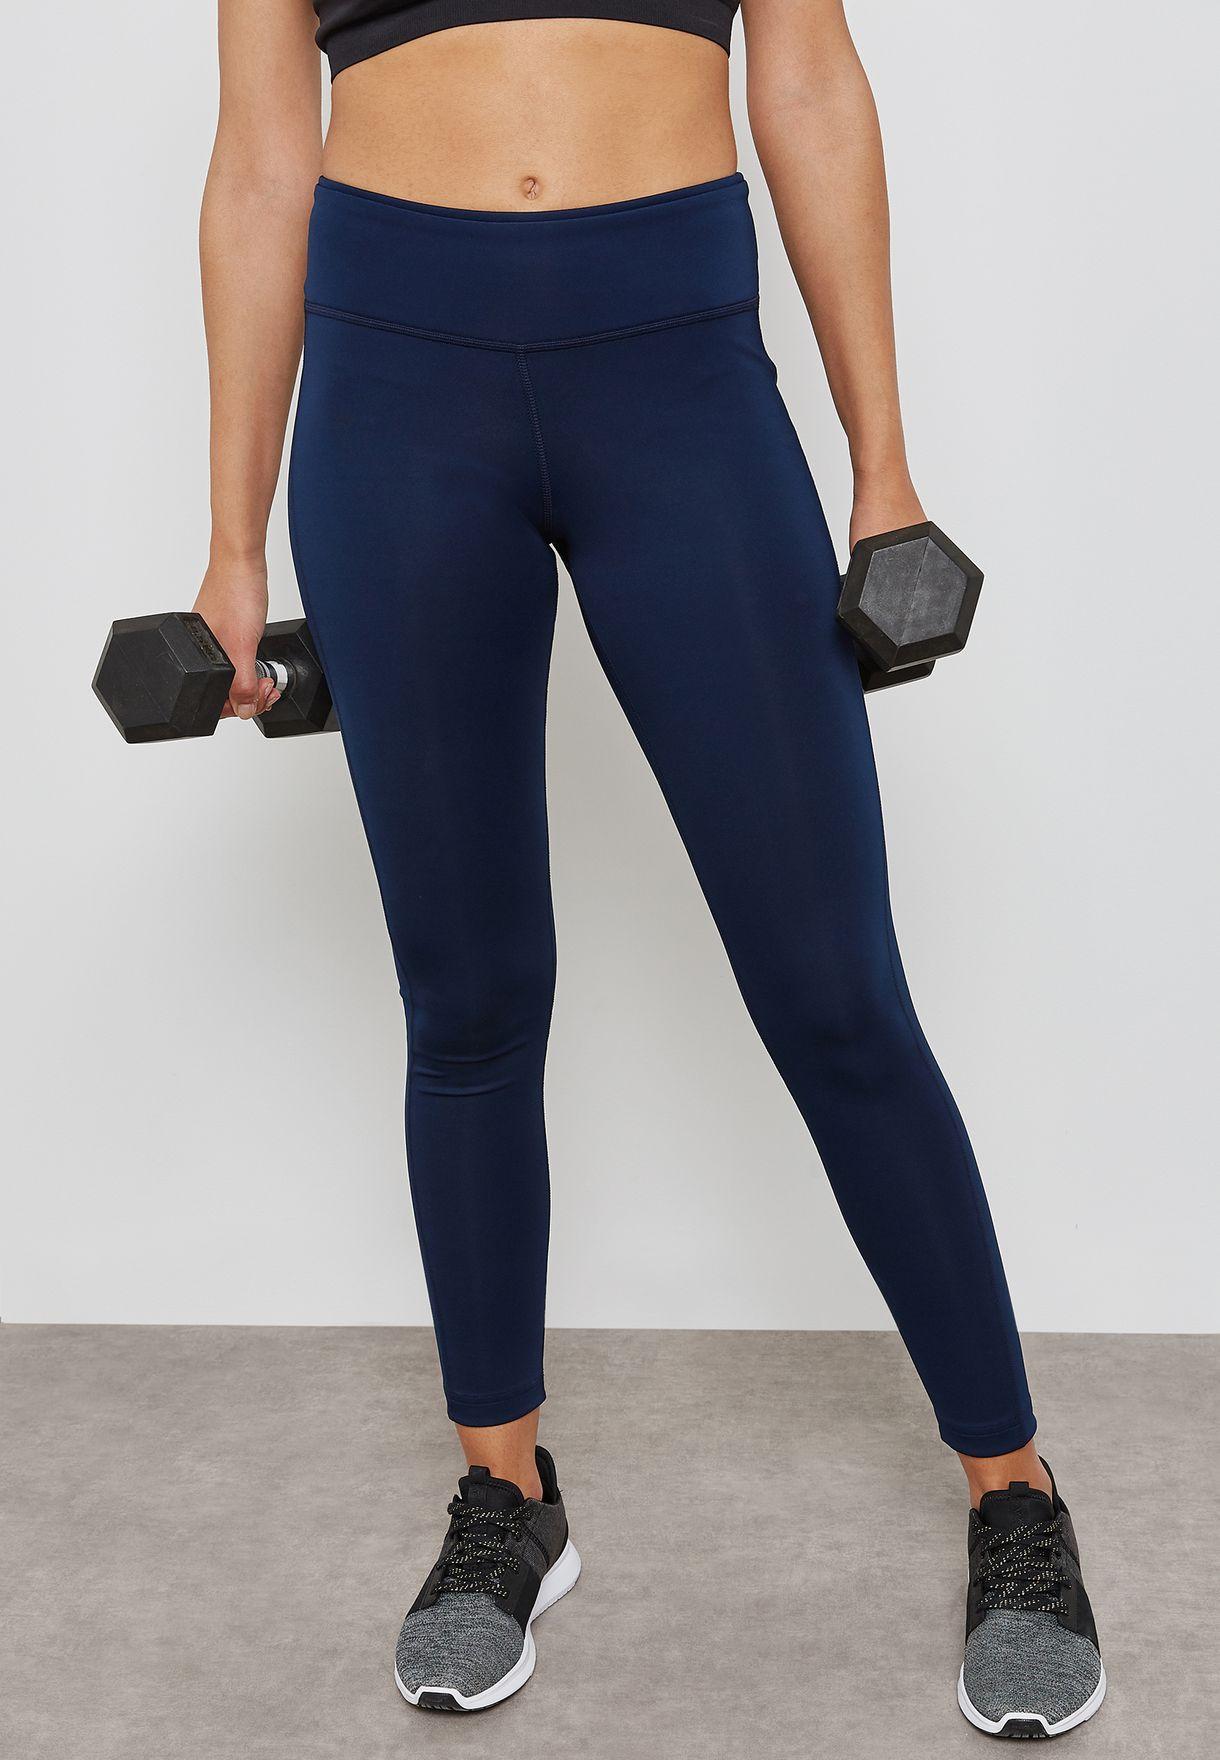 69c072f0d316ff Shop Reebok navy Workout Ready Leggings CE1241 for Women in Saudi ...